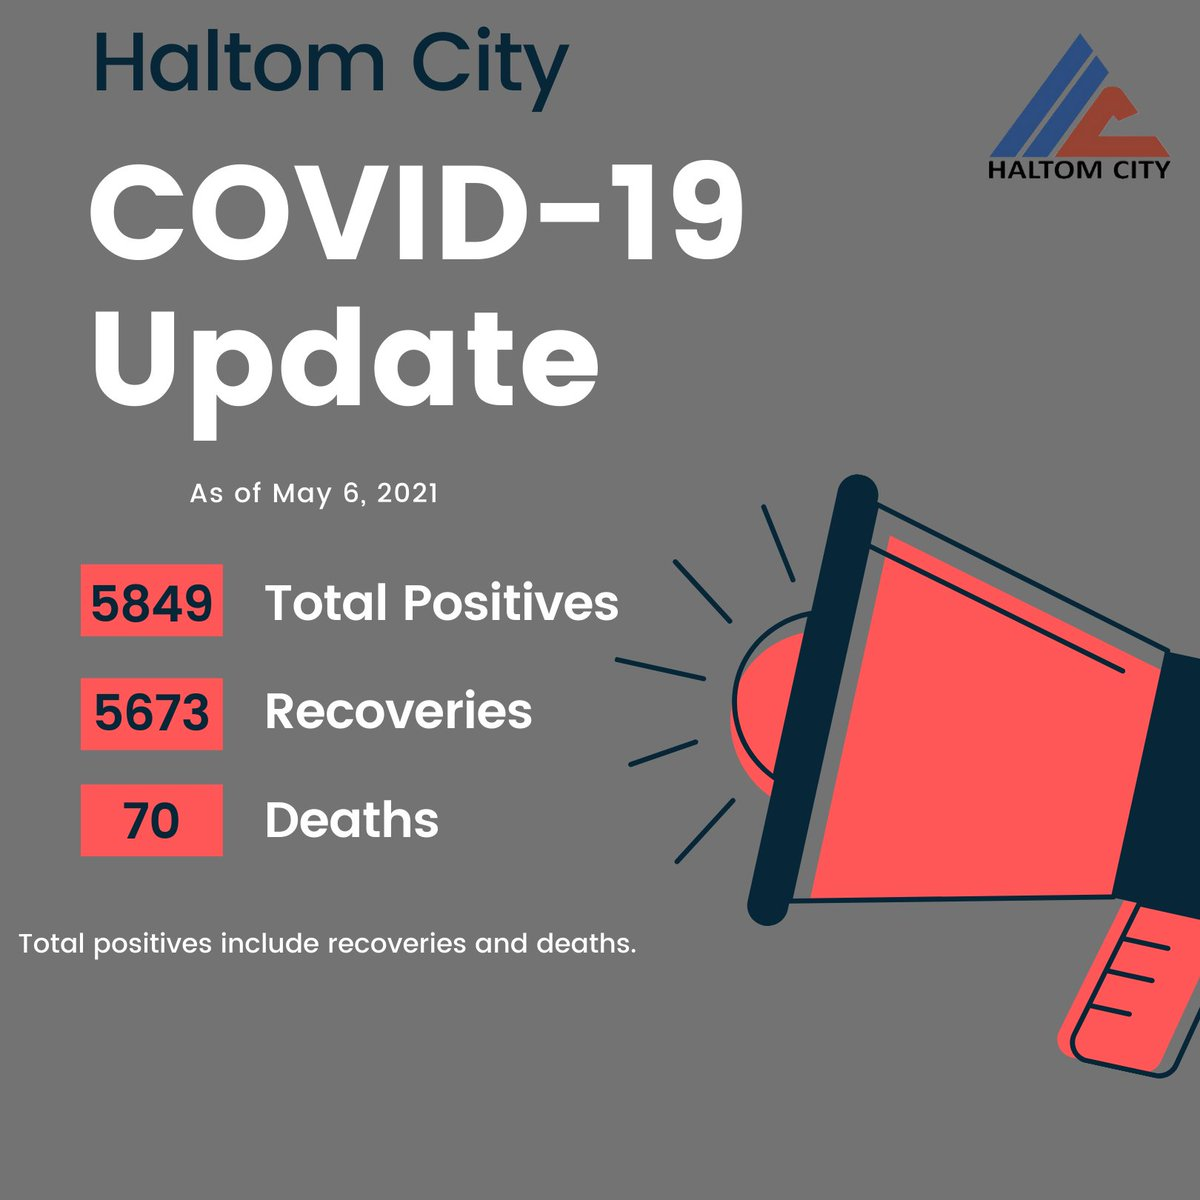 Haltom City Emergency Management